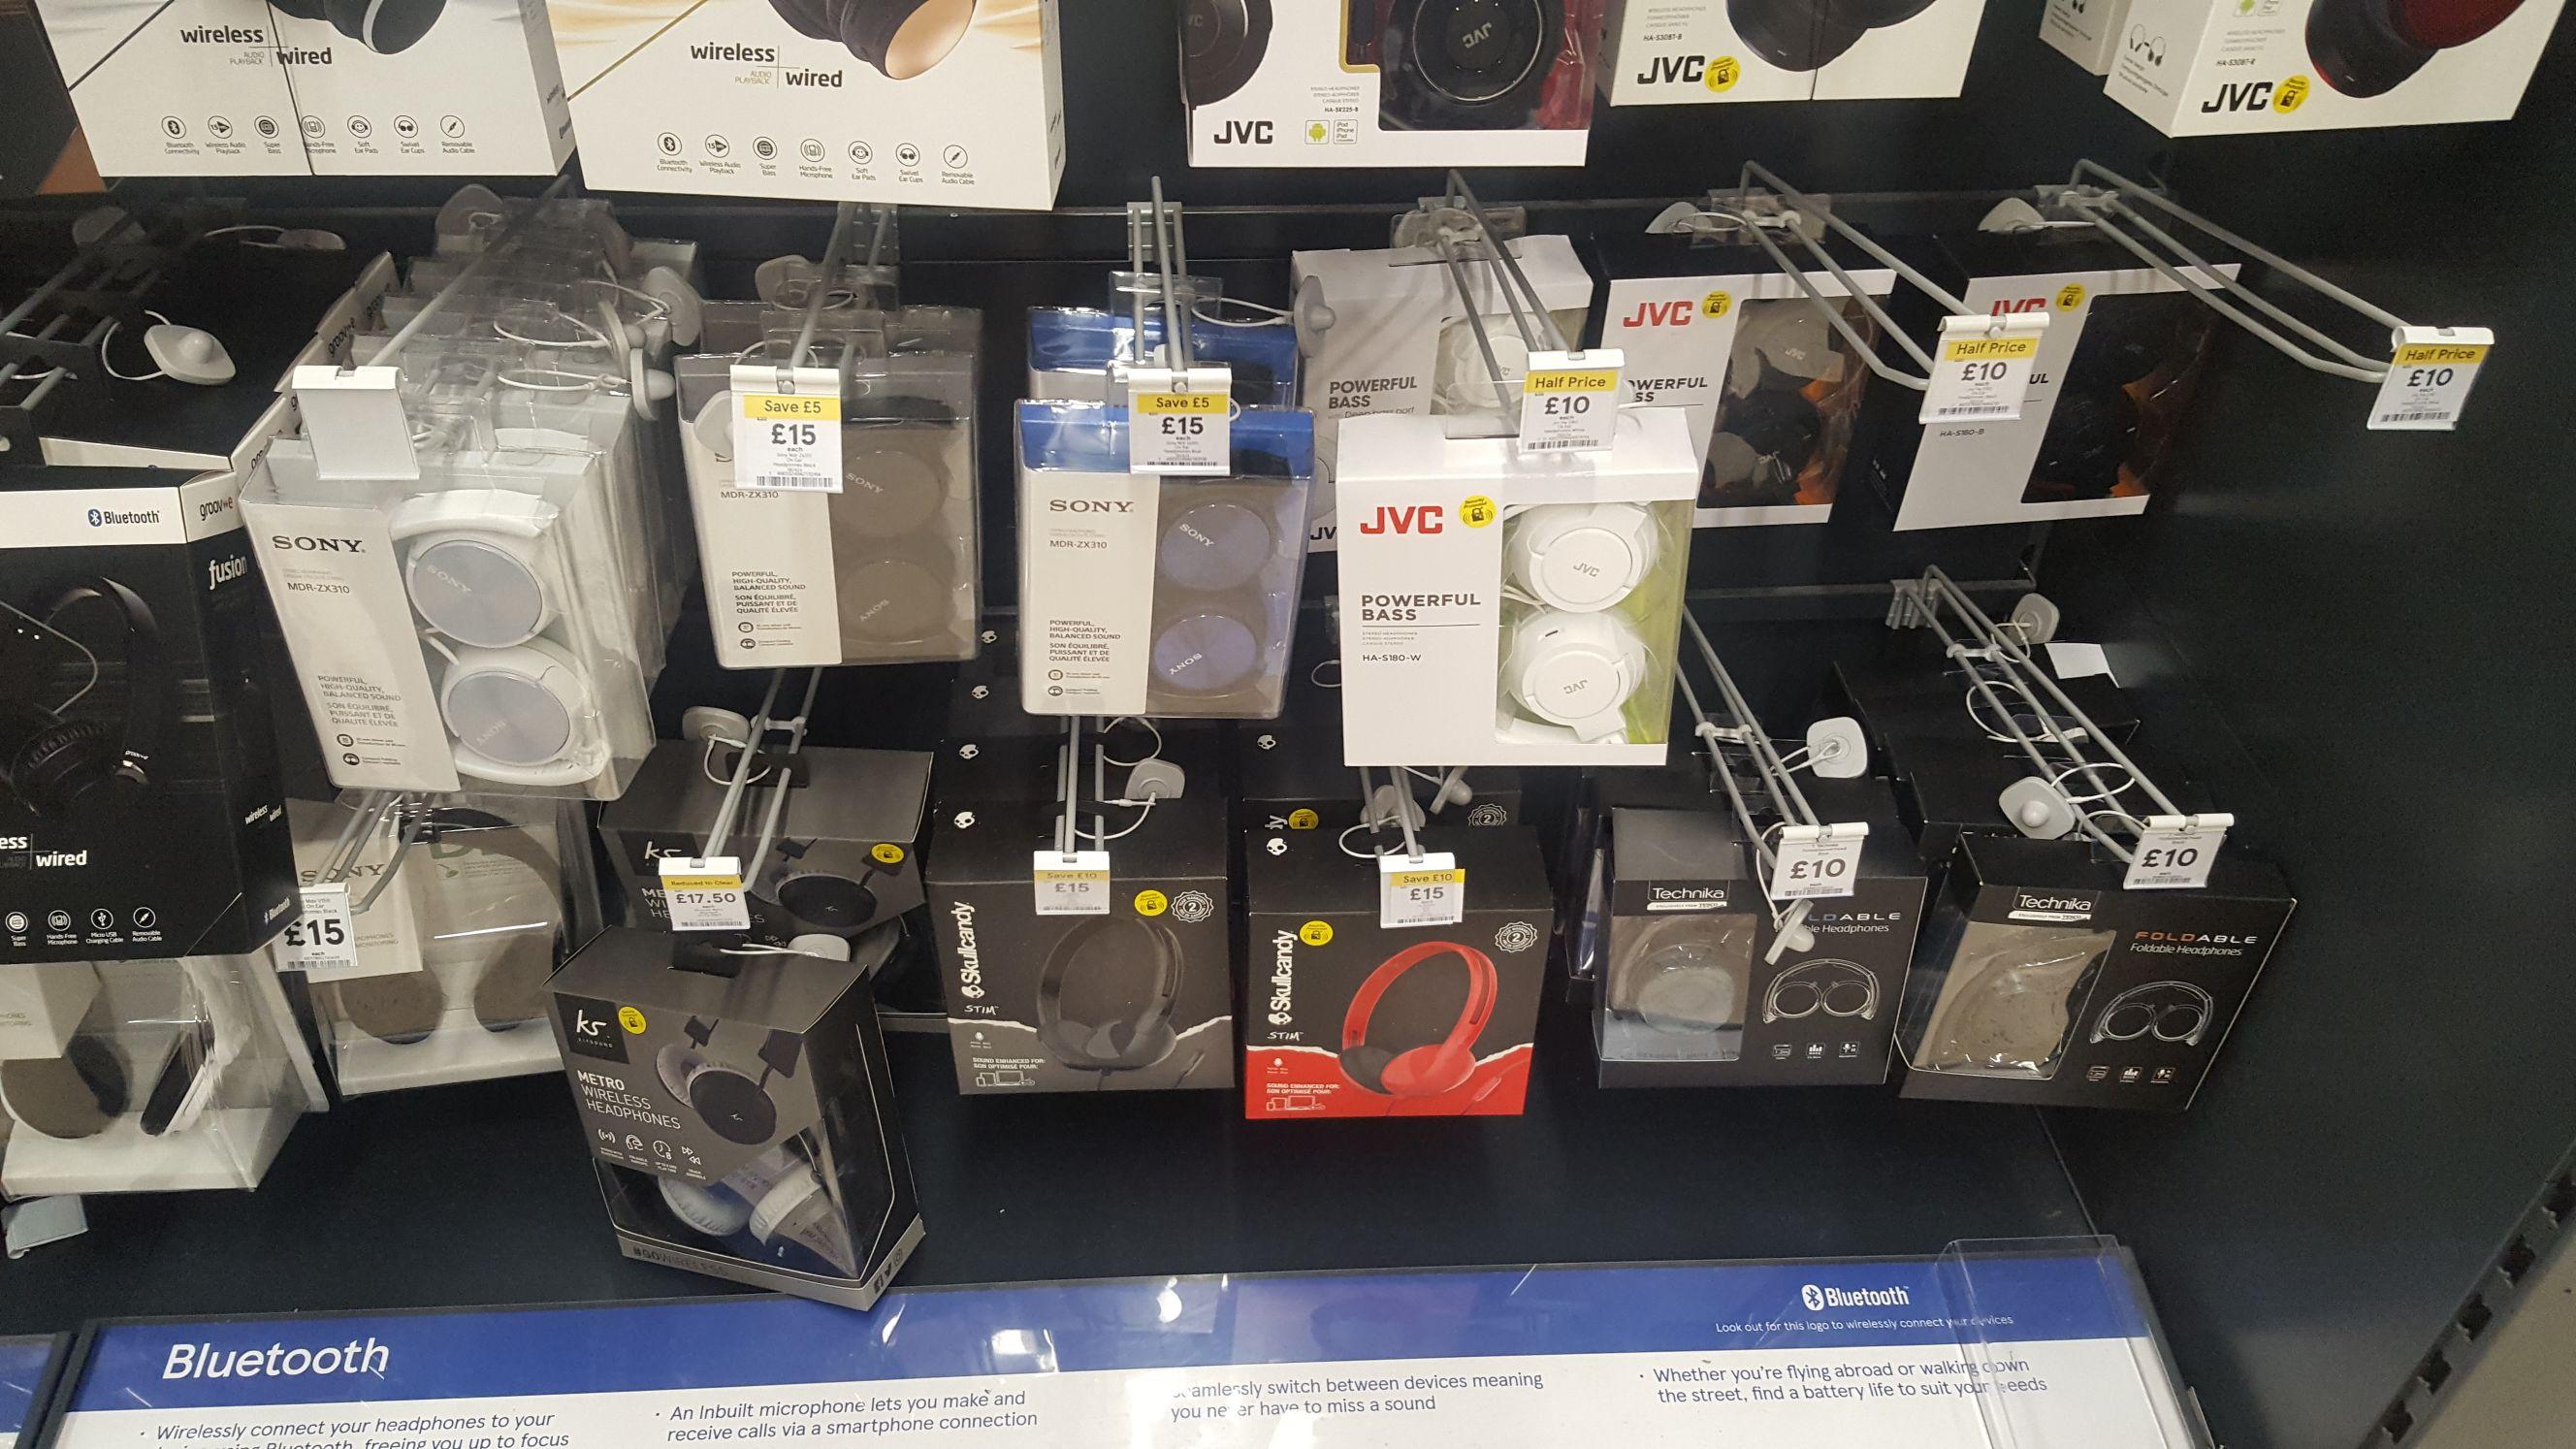 Bluetooth Wireless Headphones £10/£15 in Tesco Exeter EXE VALE Store